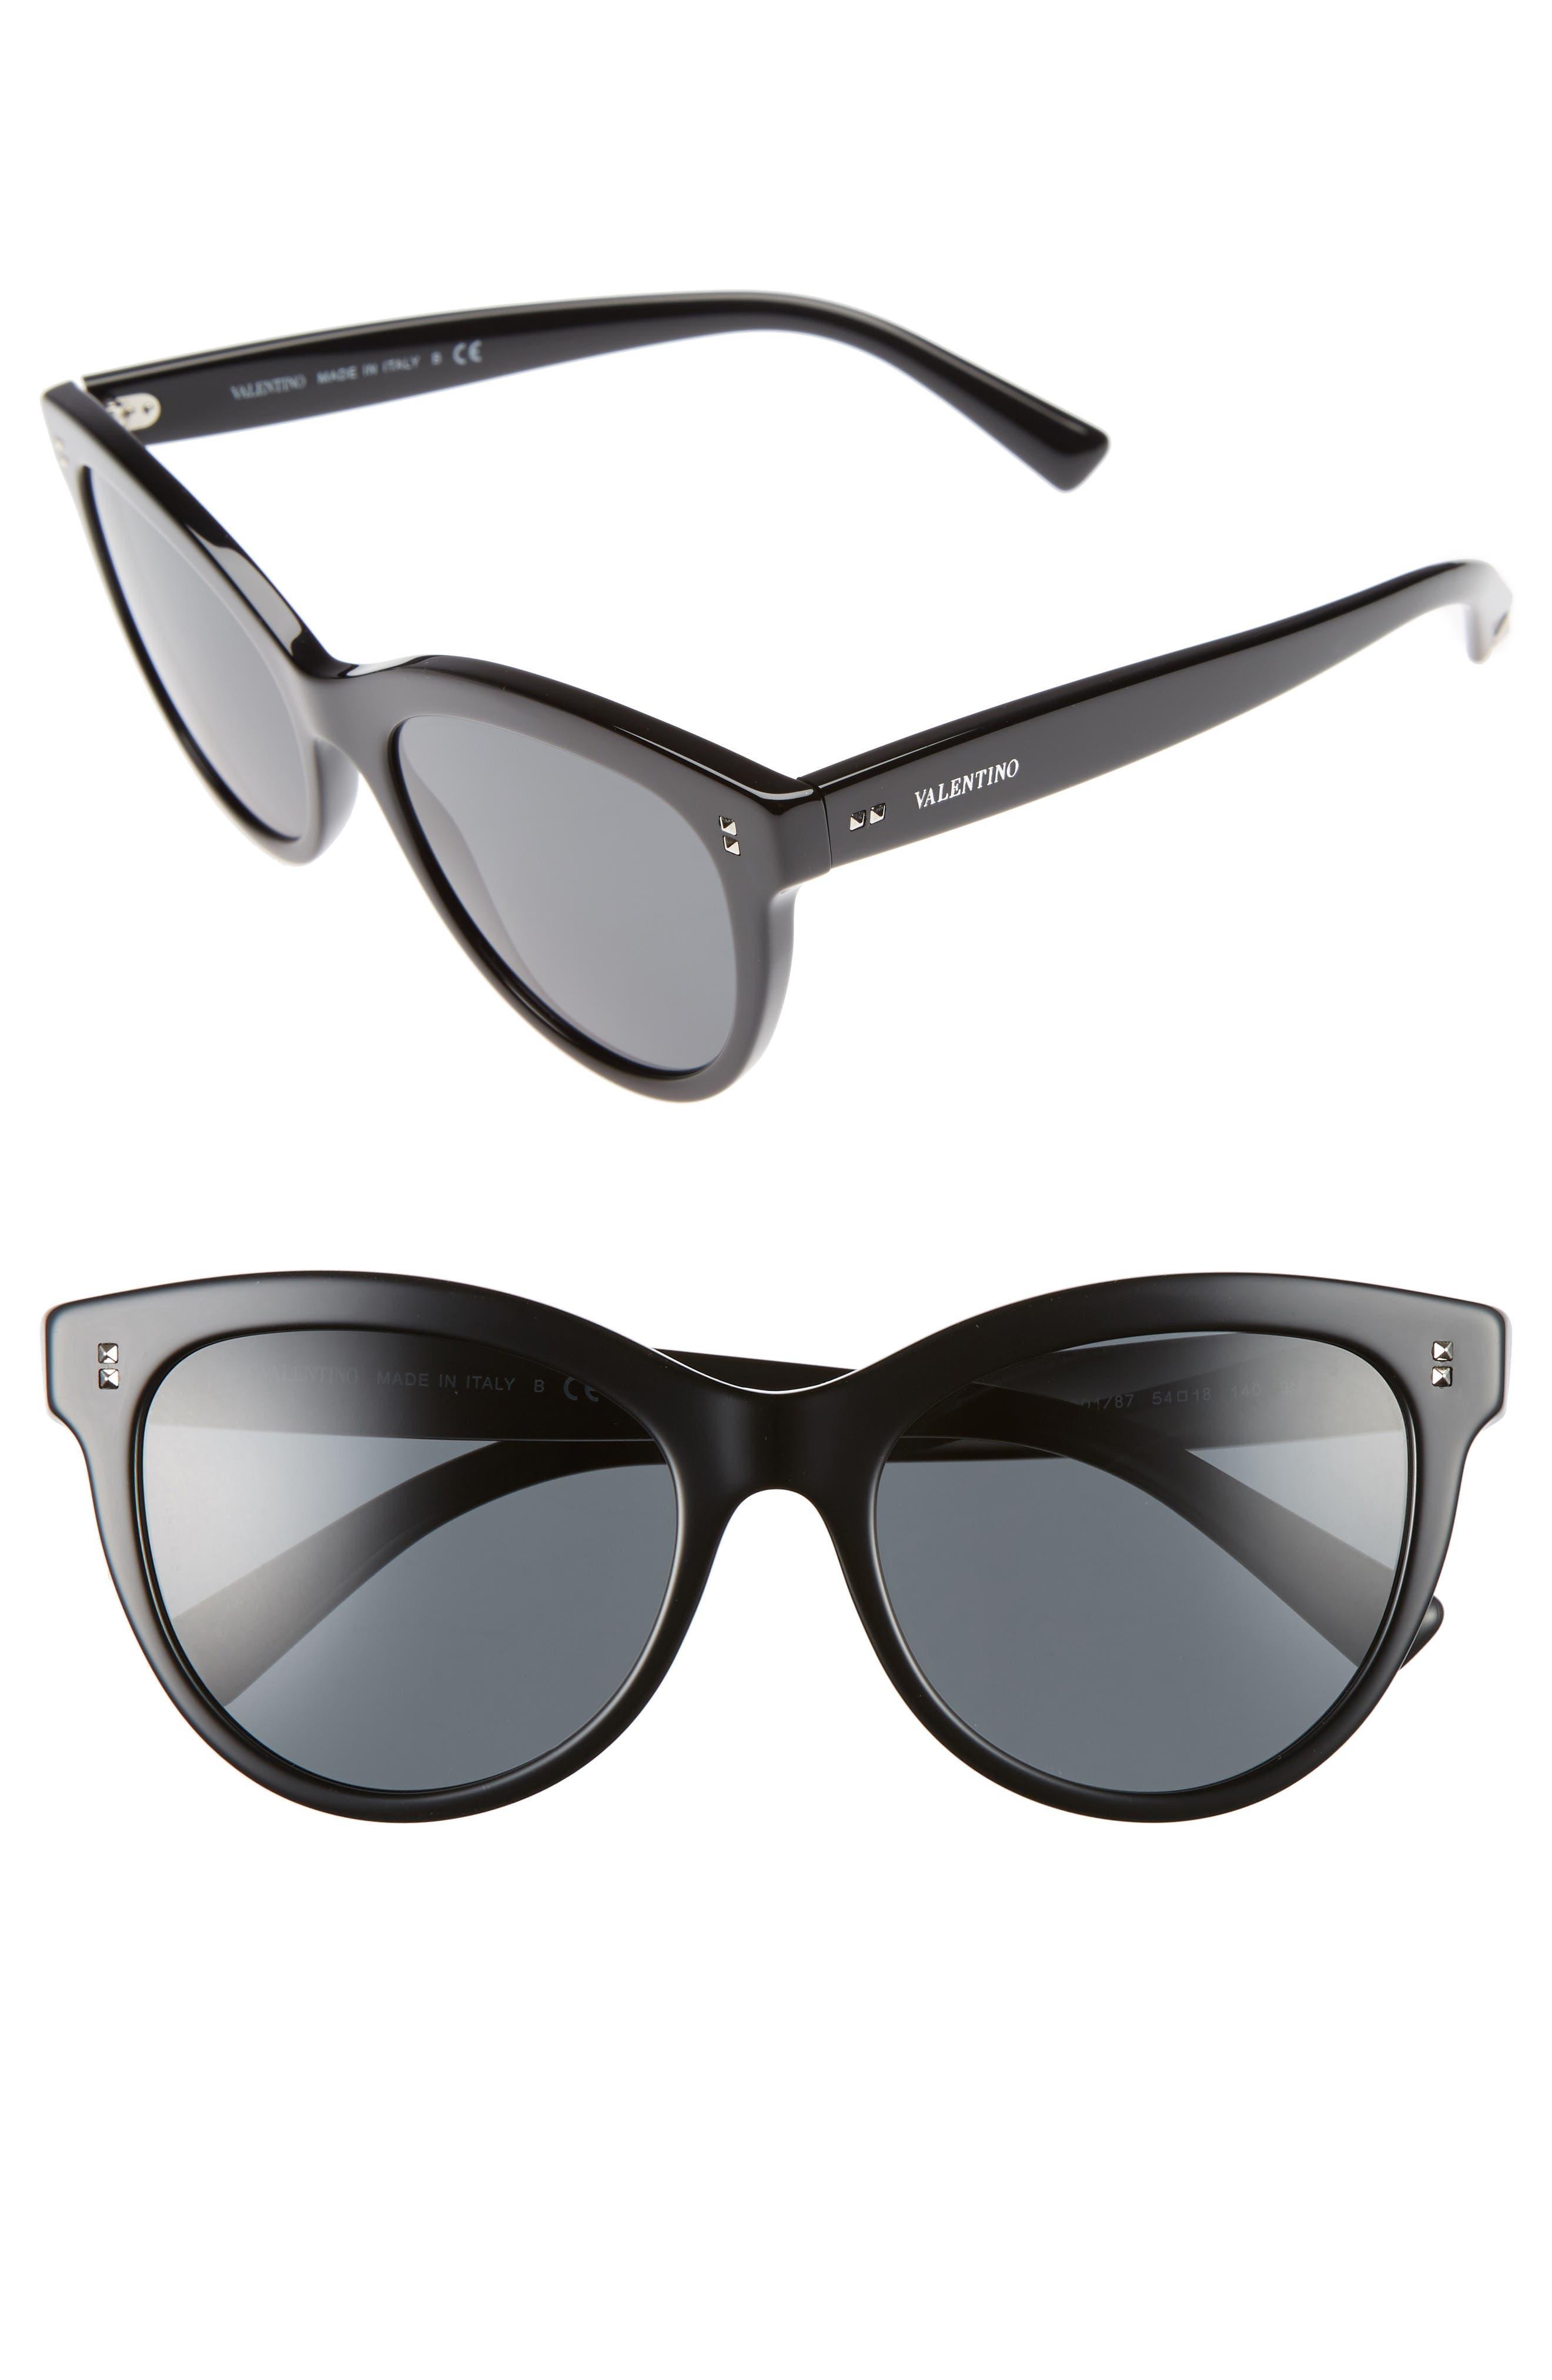 54mm Cat Eye Sunglasses,                             Main thumbnail 1, color,                             001